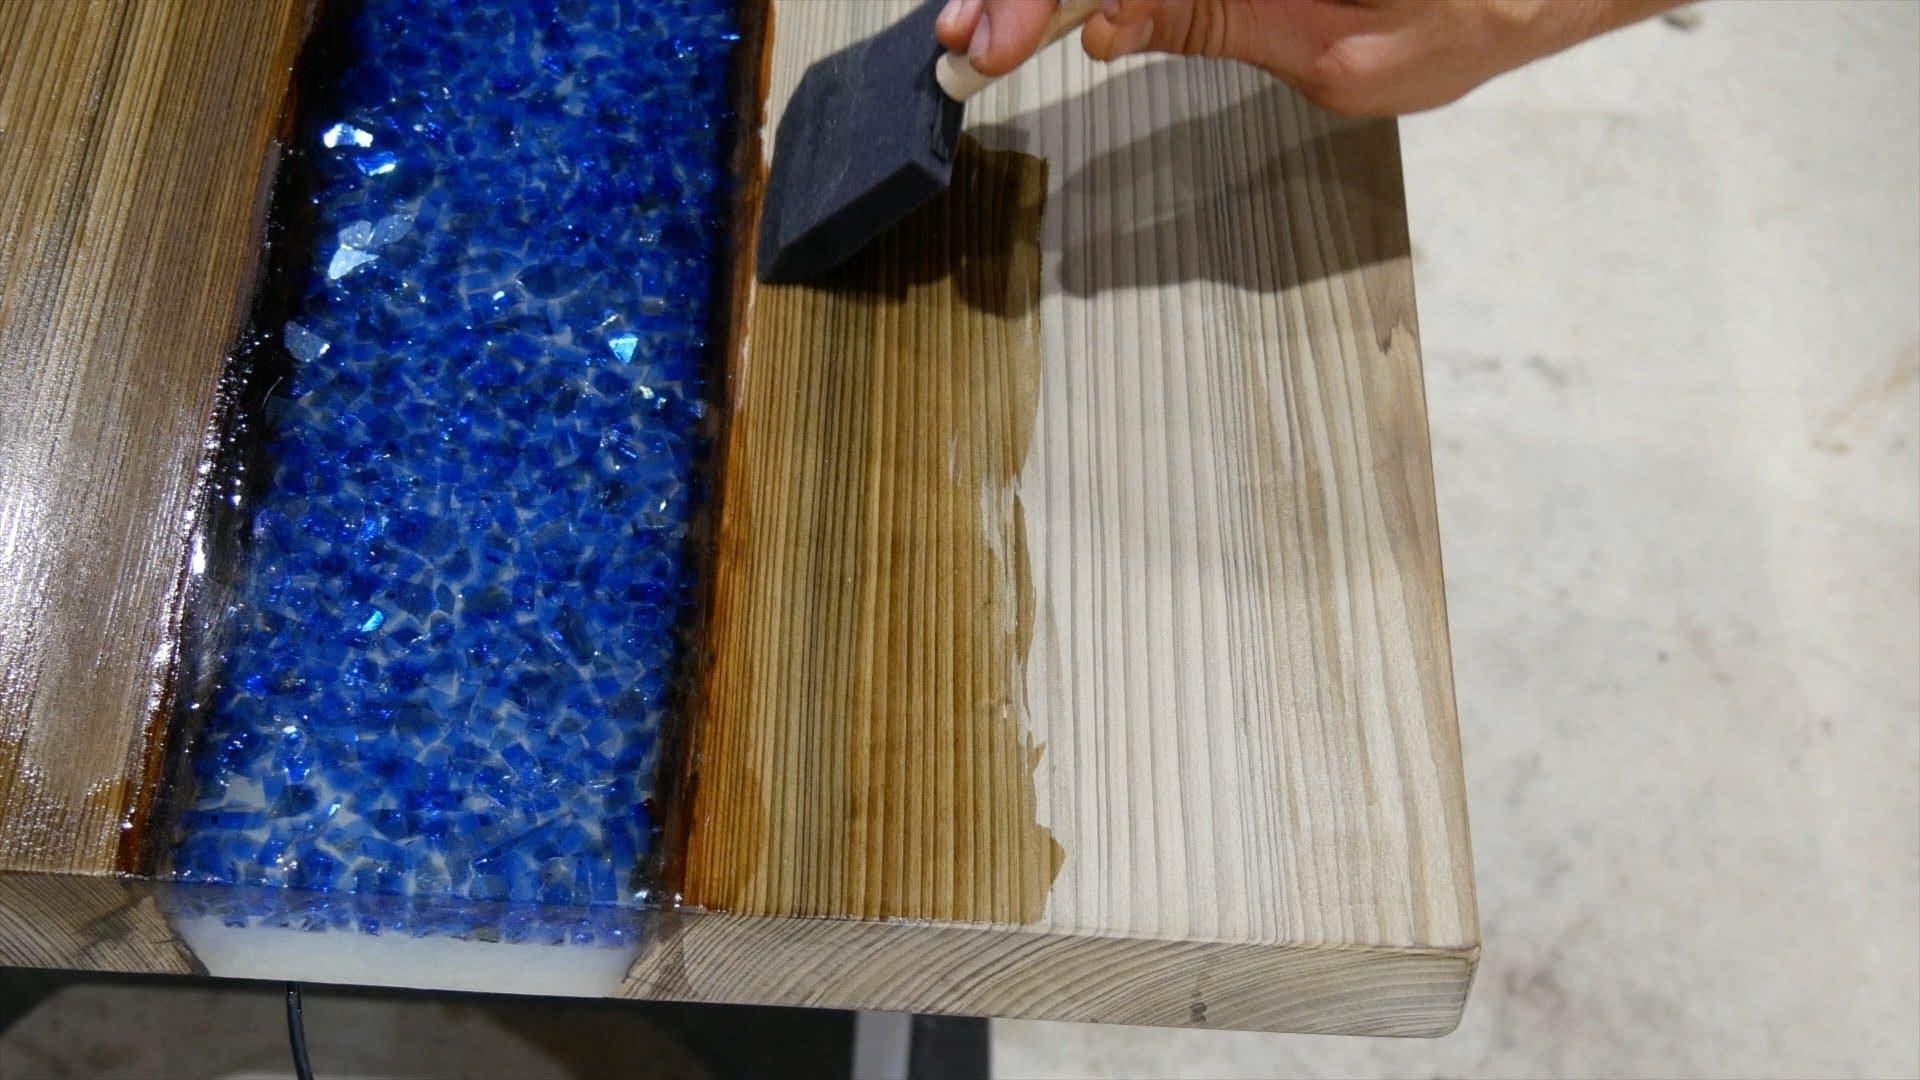 epoxy-resin-river-table-glowpowder_20171016_77